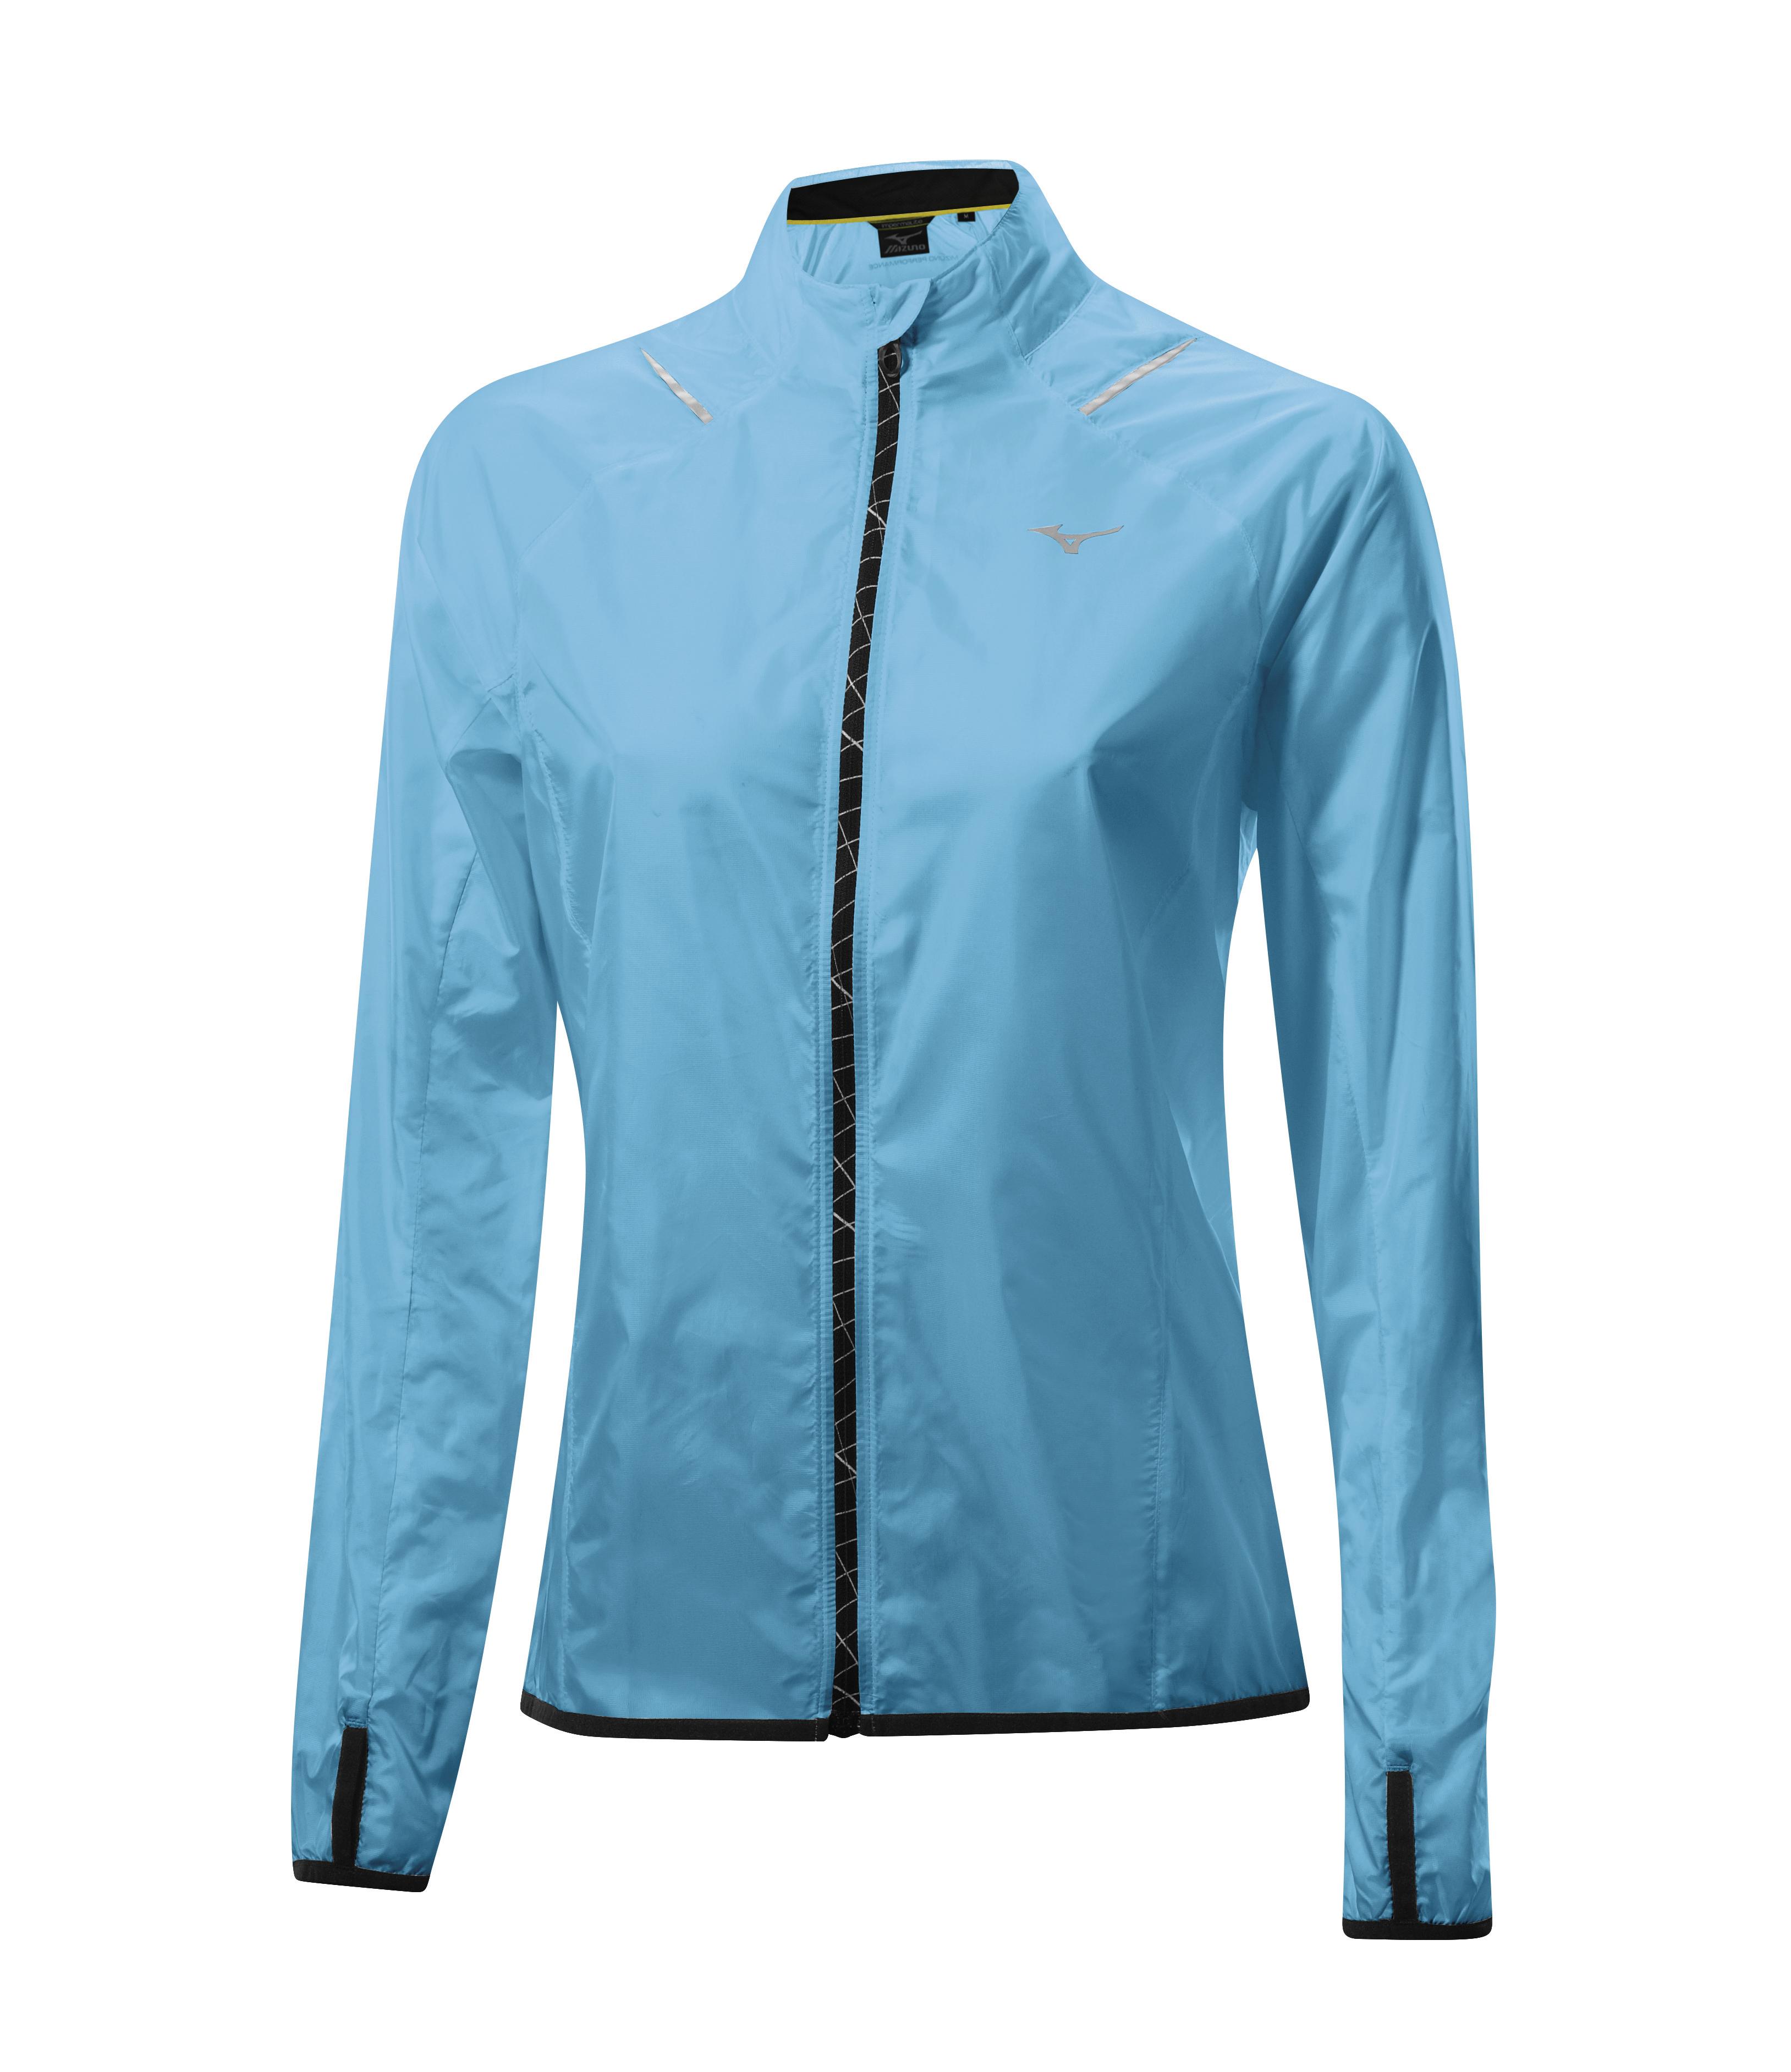 Mizuno ImpermaLite® Jacket J2GC420124 L